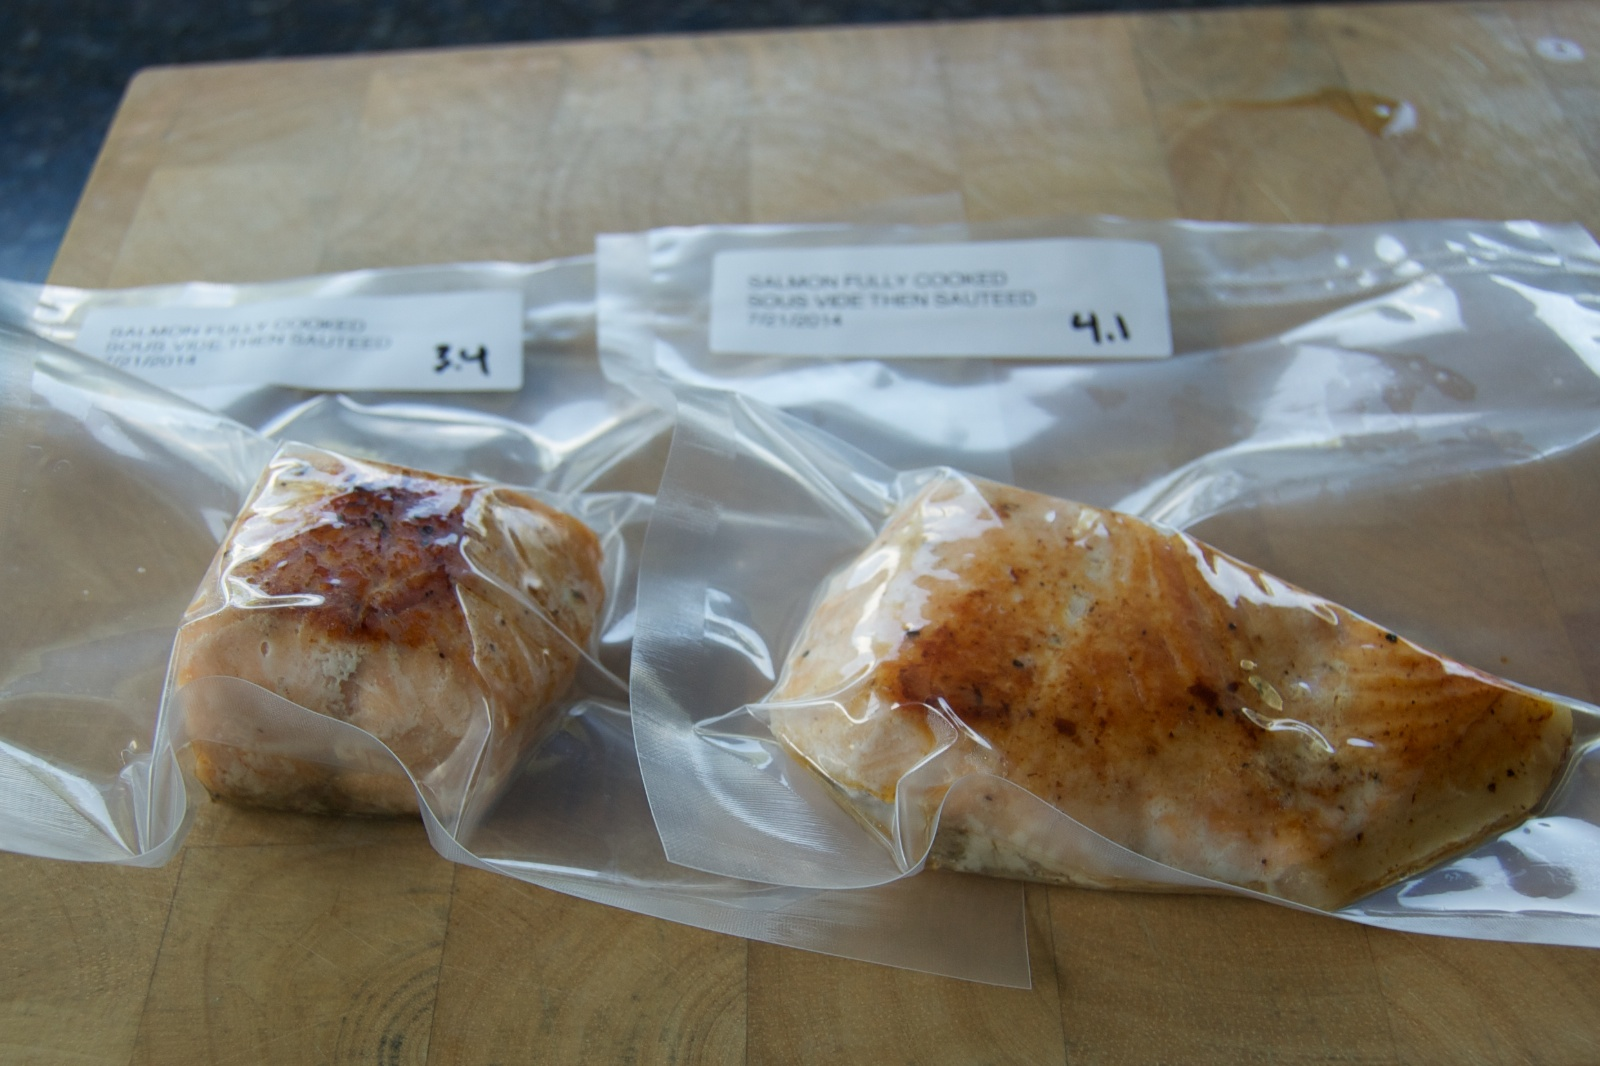 http://blog.rickk.com/food/2014/07/22/ate.2014.07.21.c3.jpg